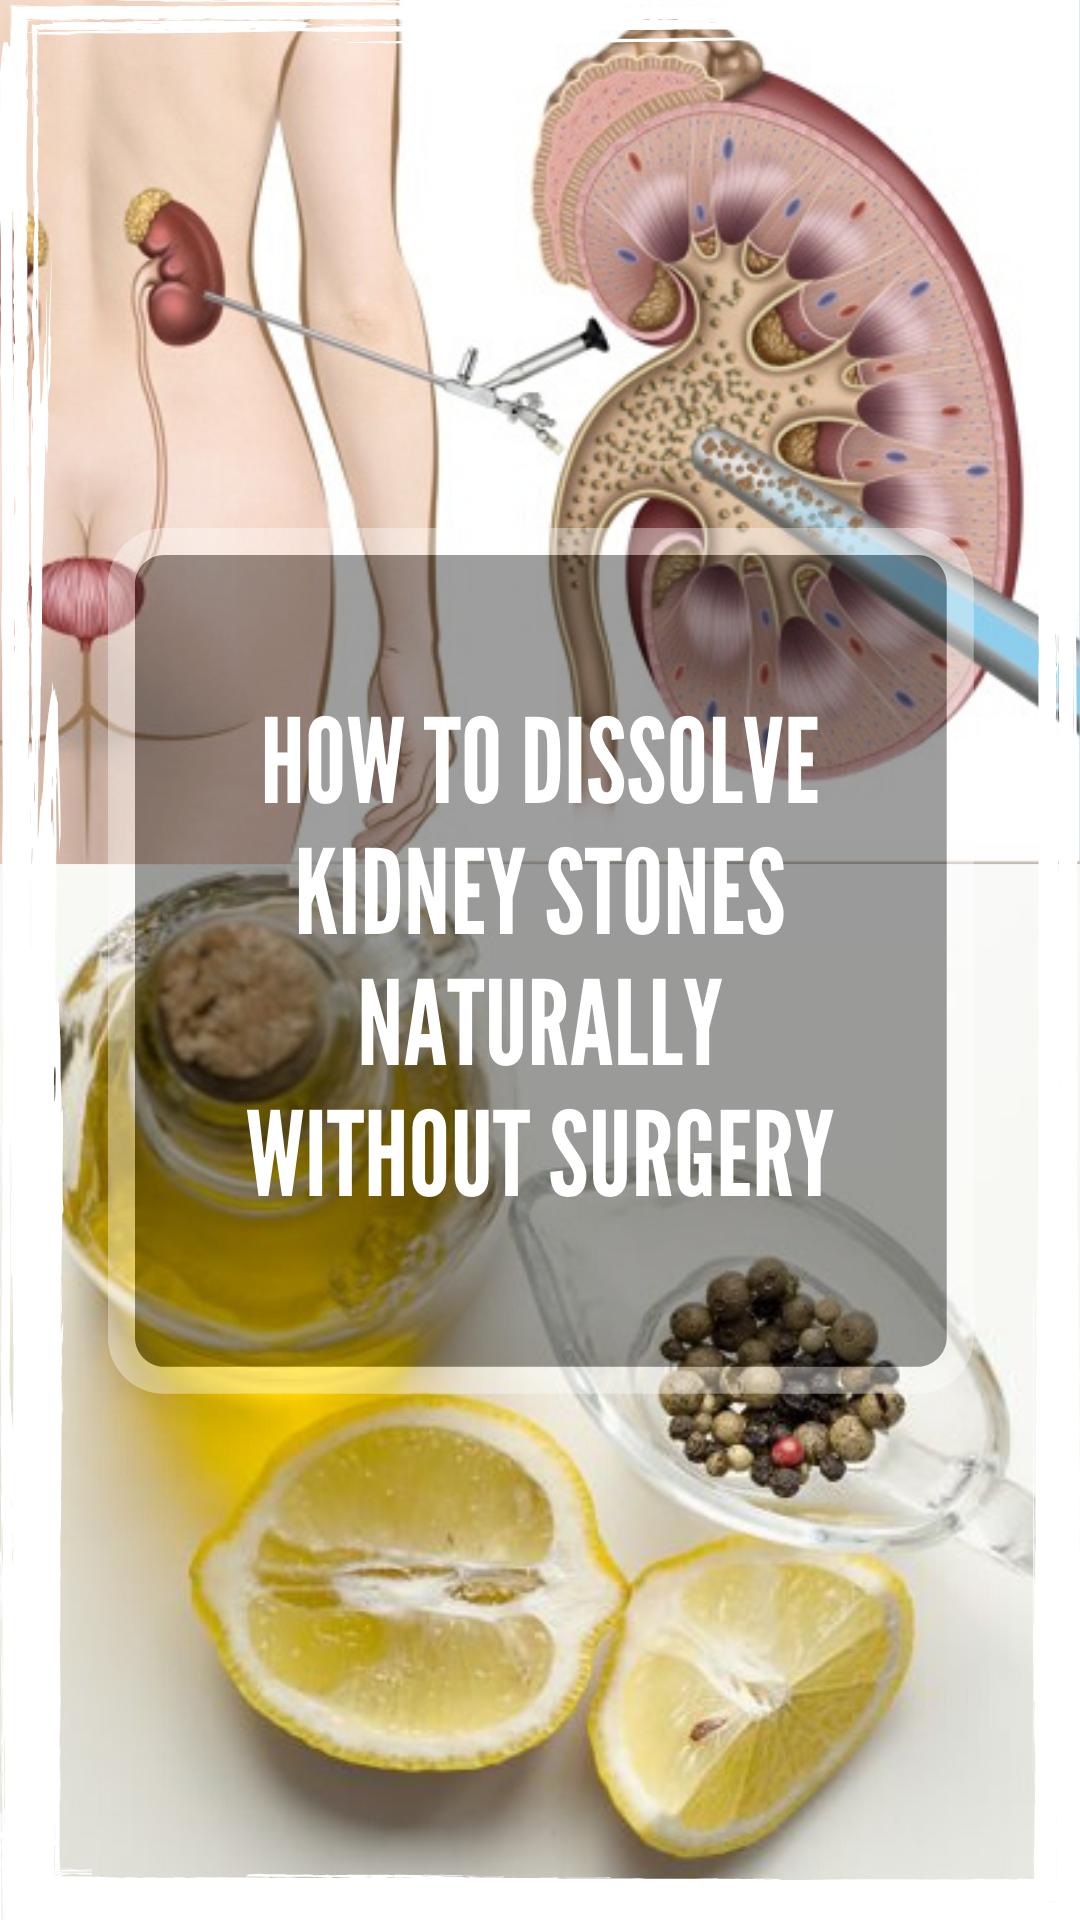 Can Green Tea Dissolve Kidney Stones